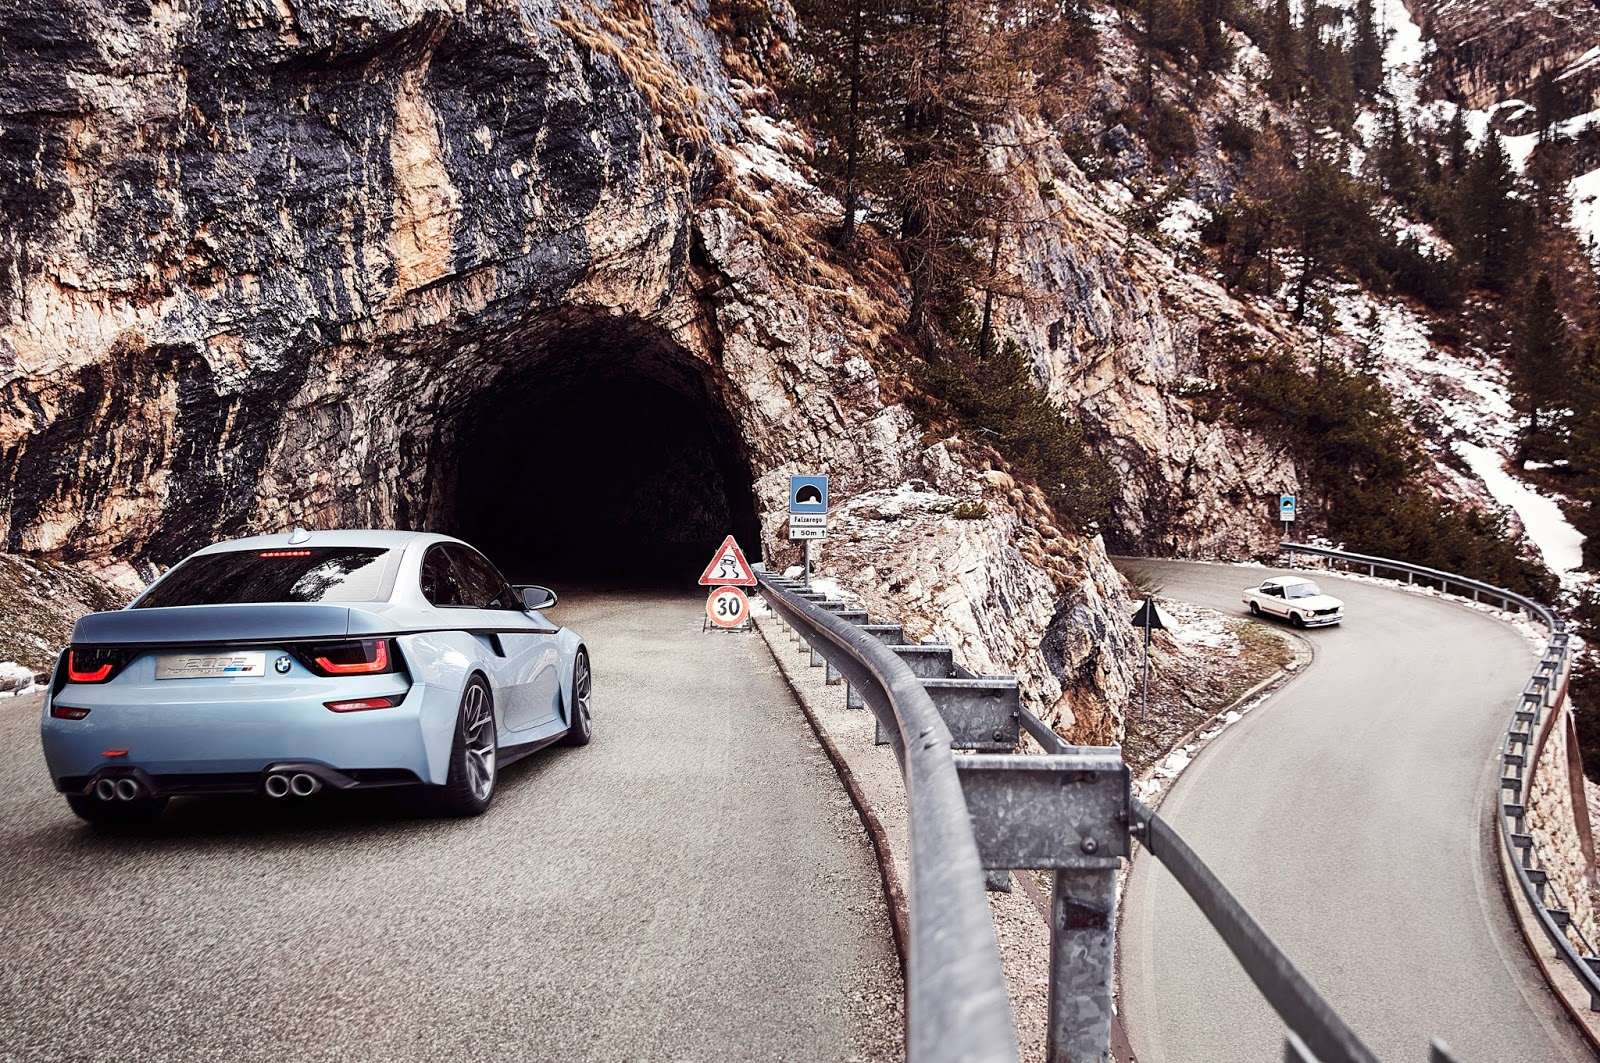 P90219720 highRes bmw 2002 hommage 05 1 1 H BMW γιορτάζει τα 50 χρόνια της θρυλικής 2002 turbo και παρουσιάζει την Bmw 2002 Hommage BMW, BMW 2002, BMW 2002 turbo, BMW Concept, BMW Hommage, supercars, videos